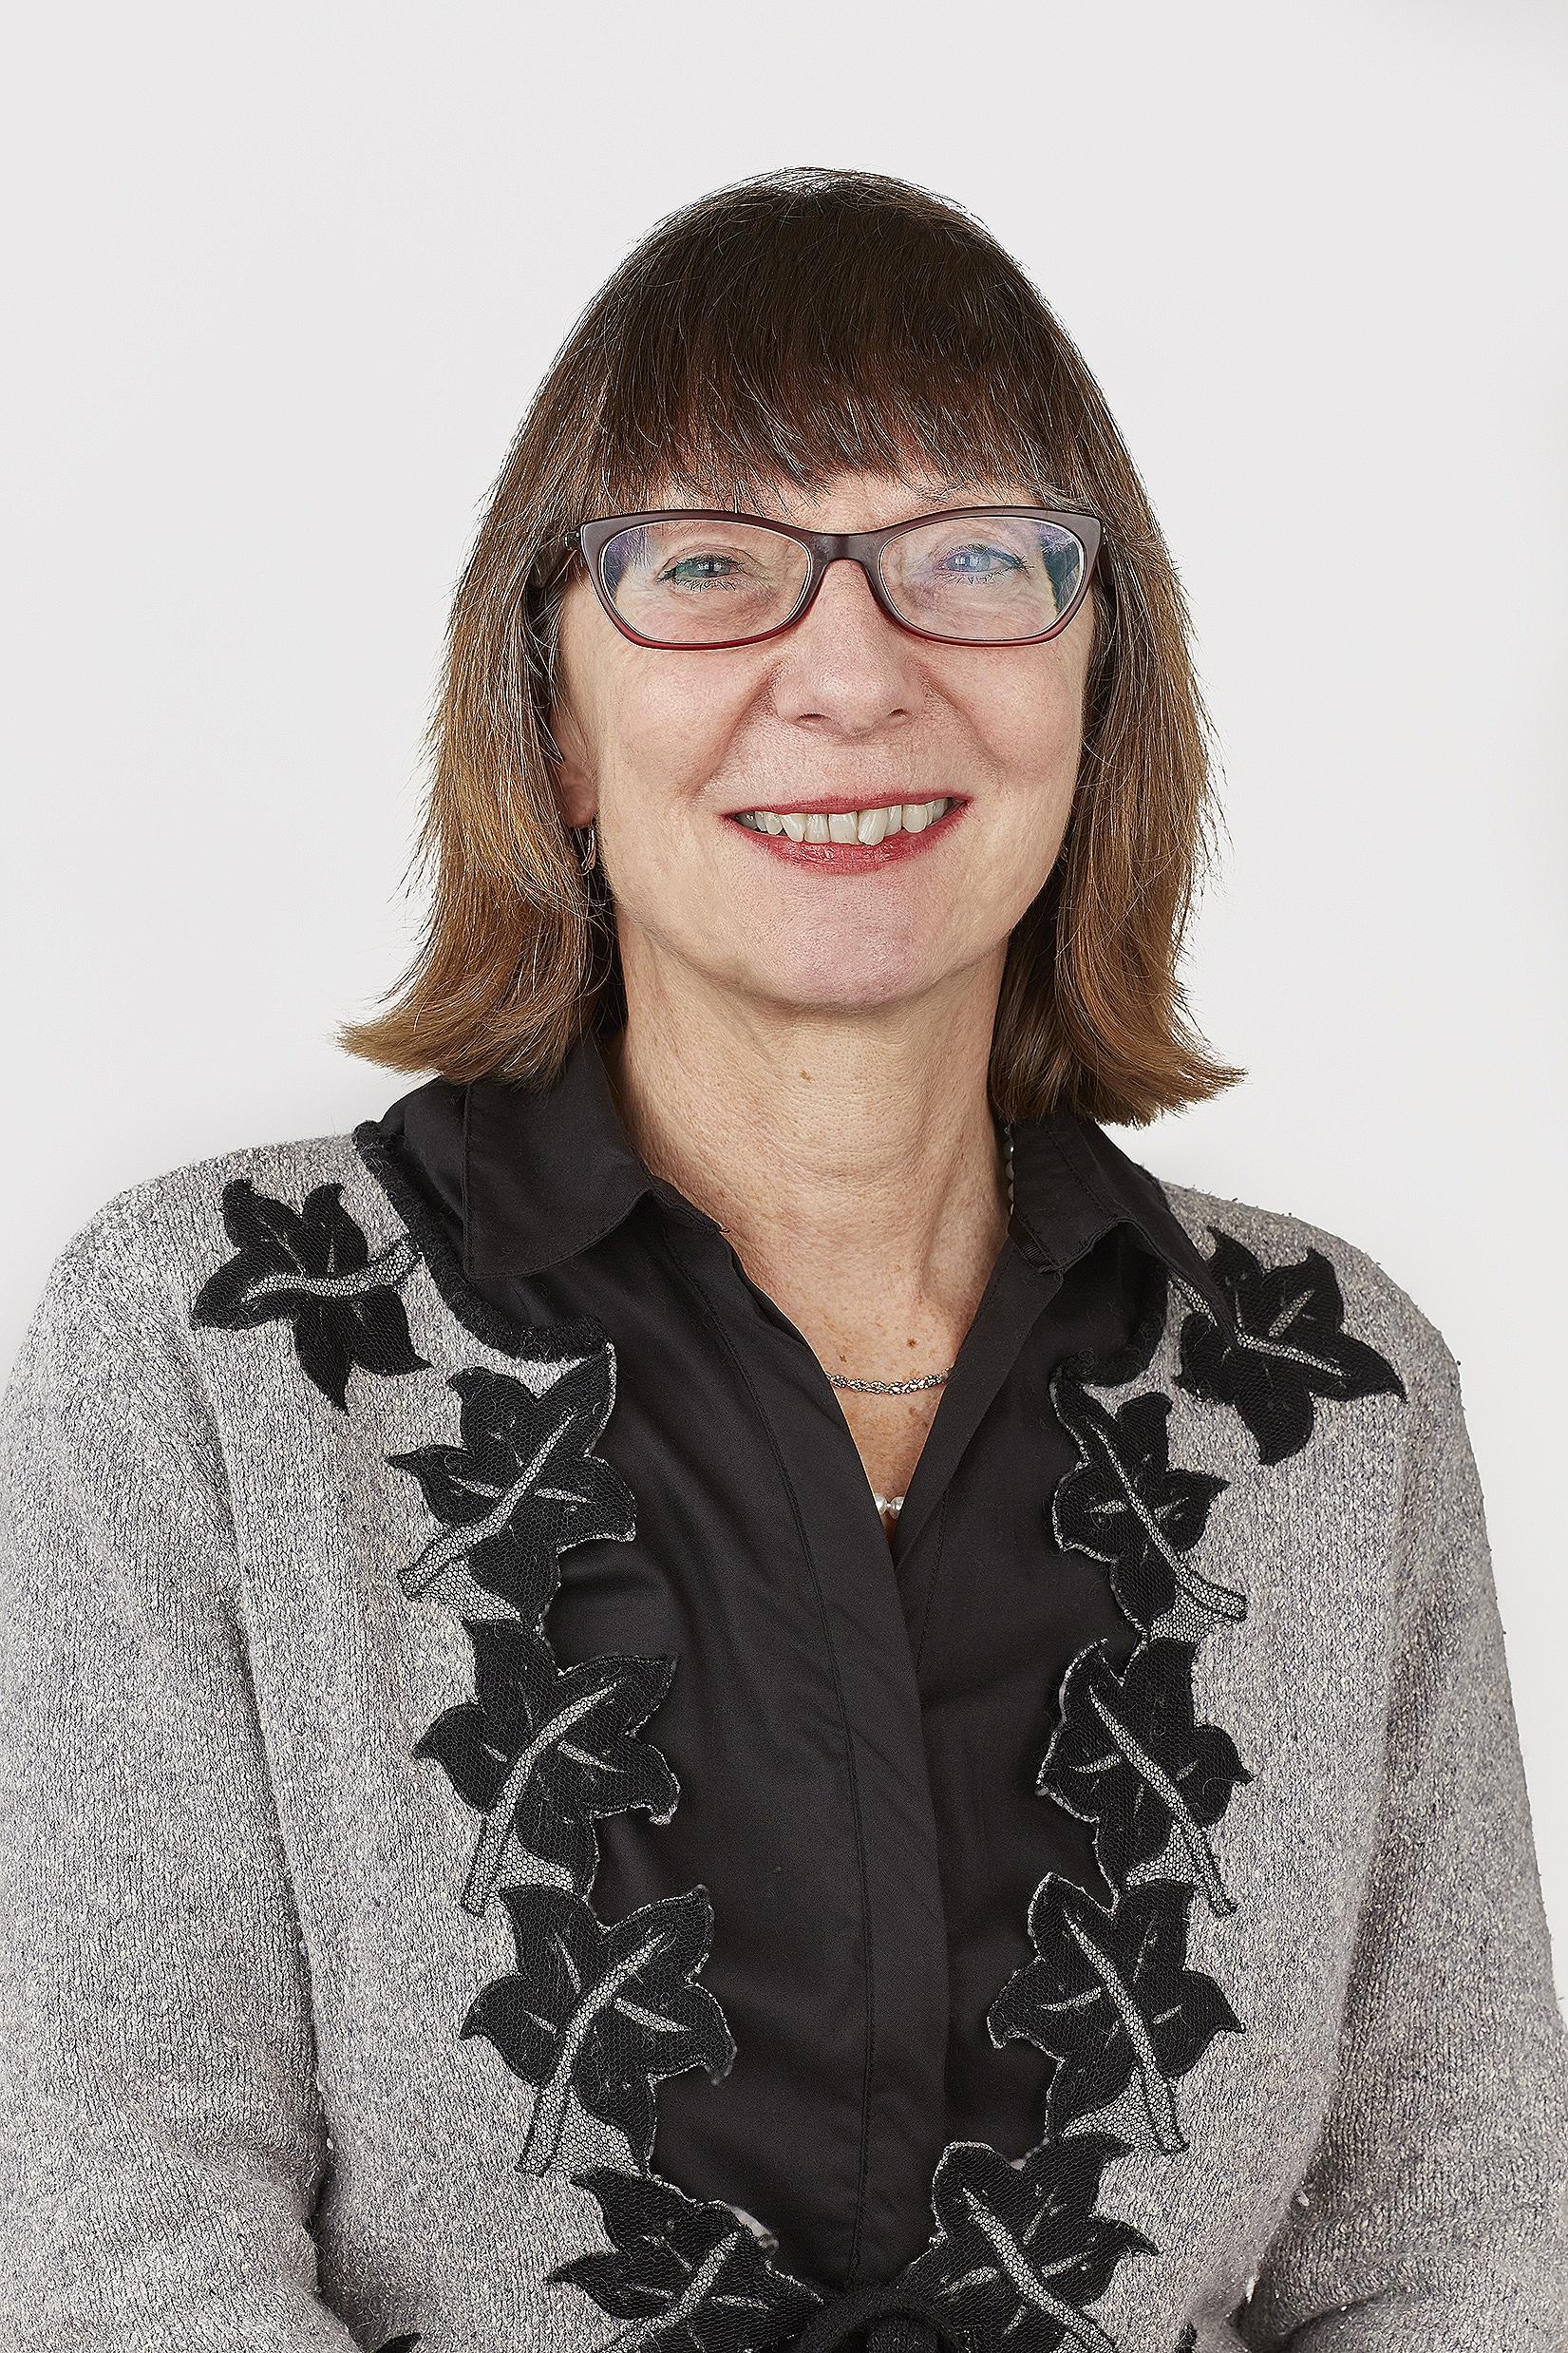 Mrs. STEPHANIE Tutor